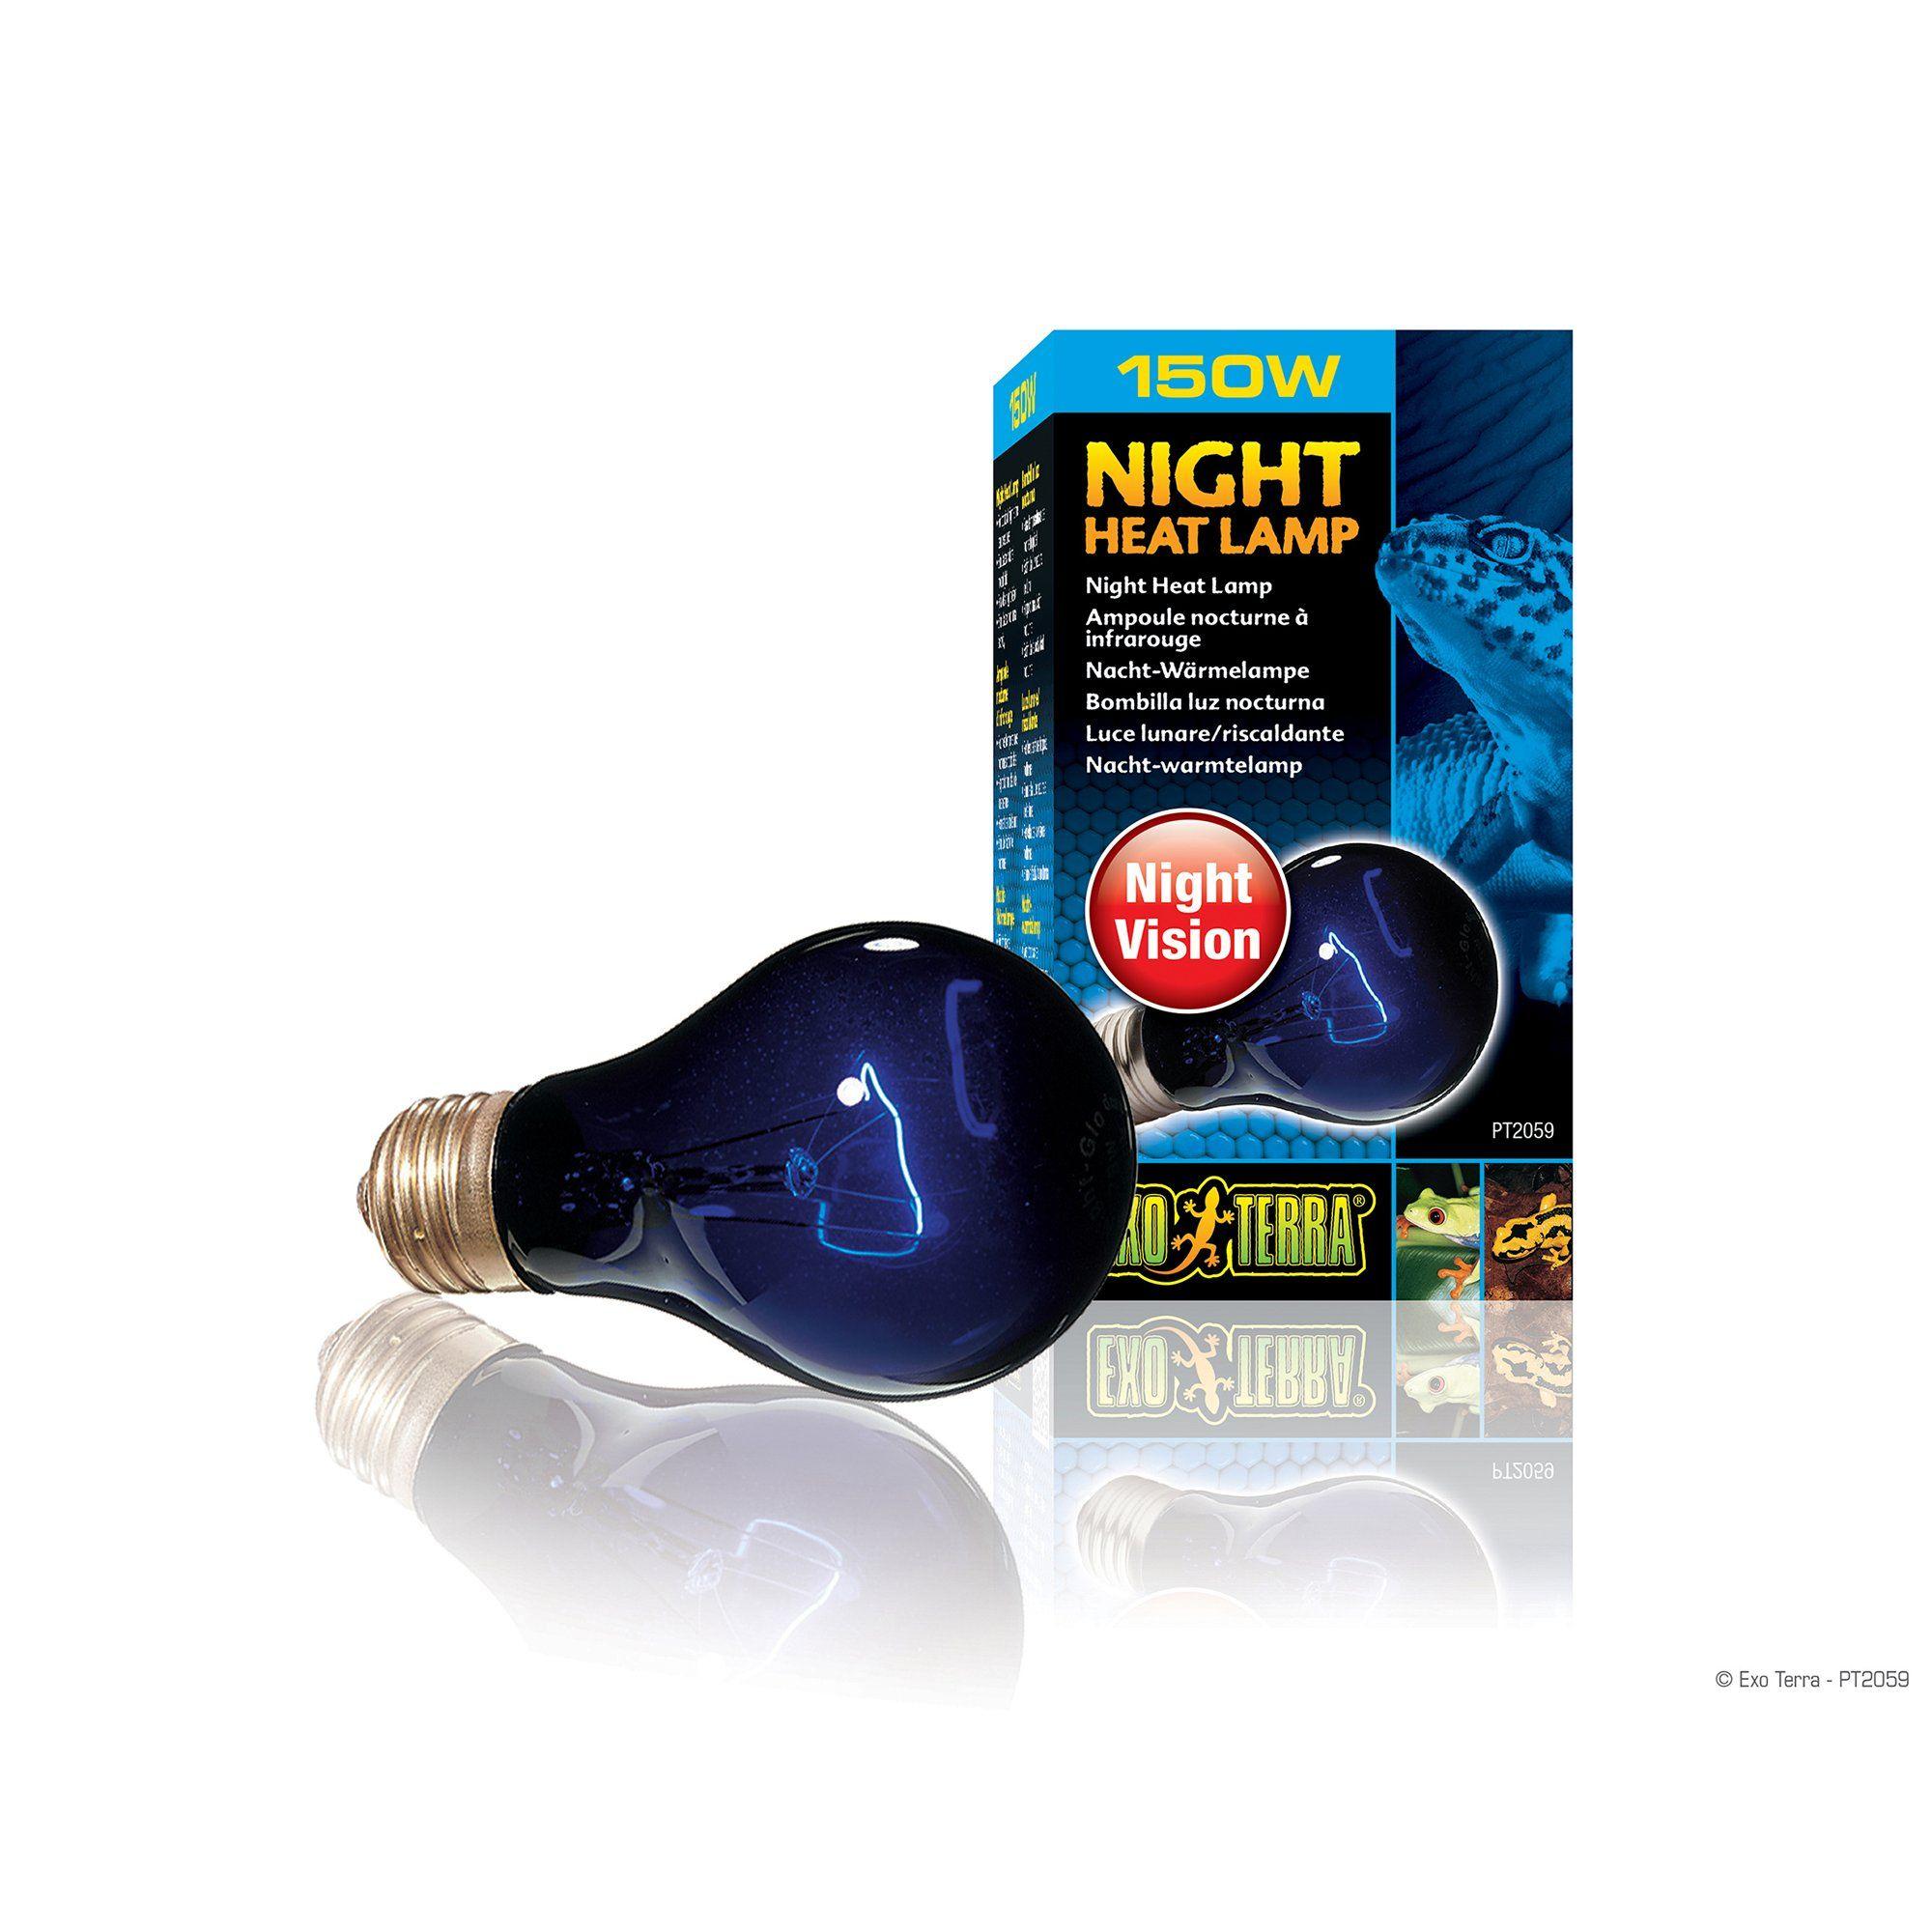 Exo Terra Night Heat Lamp 150 Watt Petco In 2020 Heat Lamps Reptile Lights Night